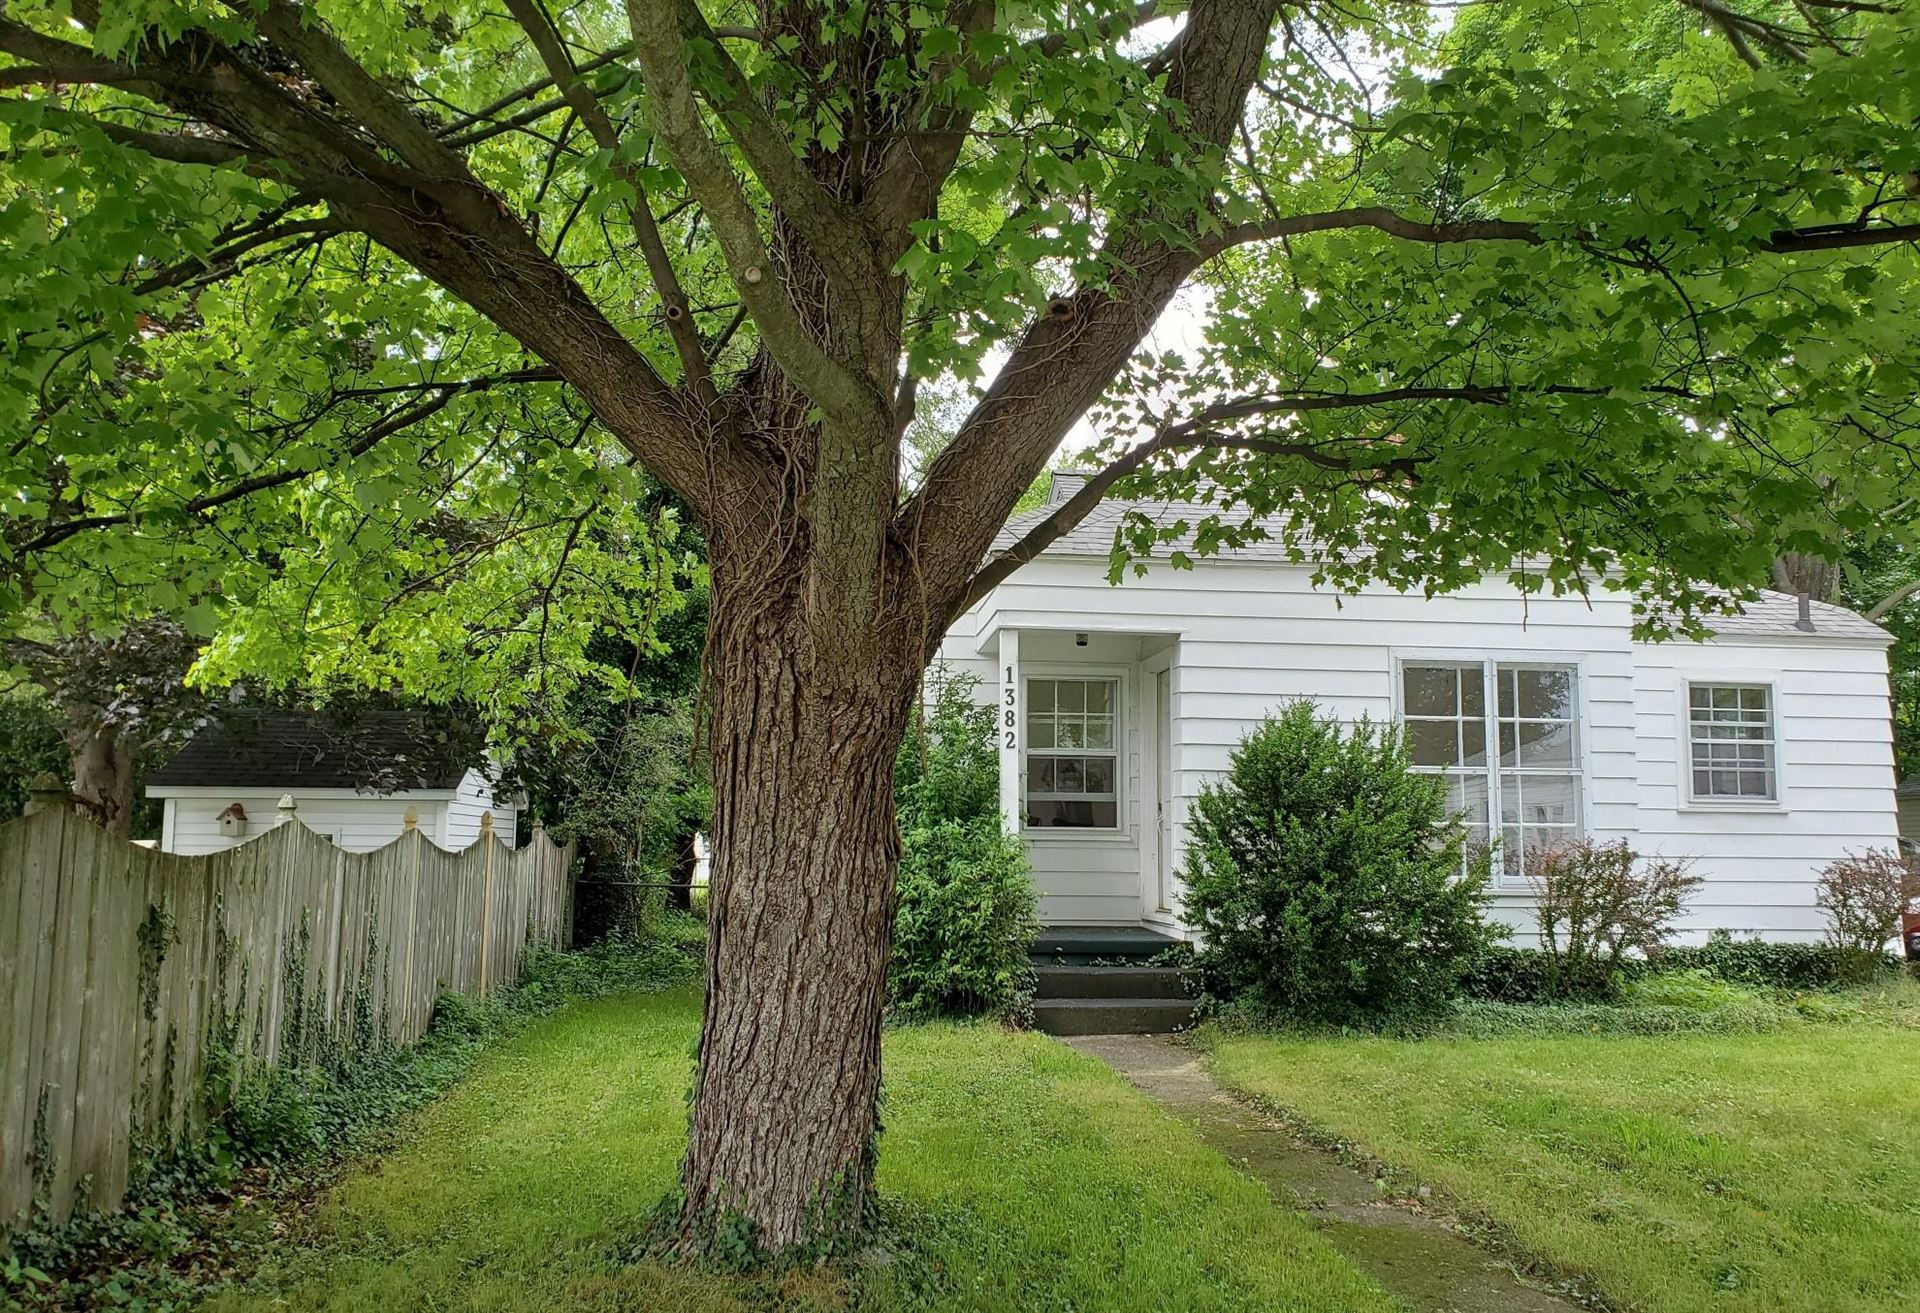 Photo of 1382 Montague Avenue, Muskegon, MI 49441 (MLS # 21033717)